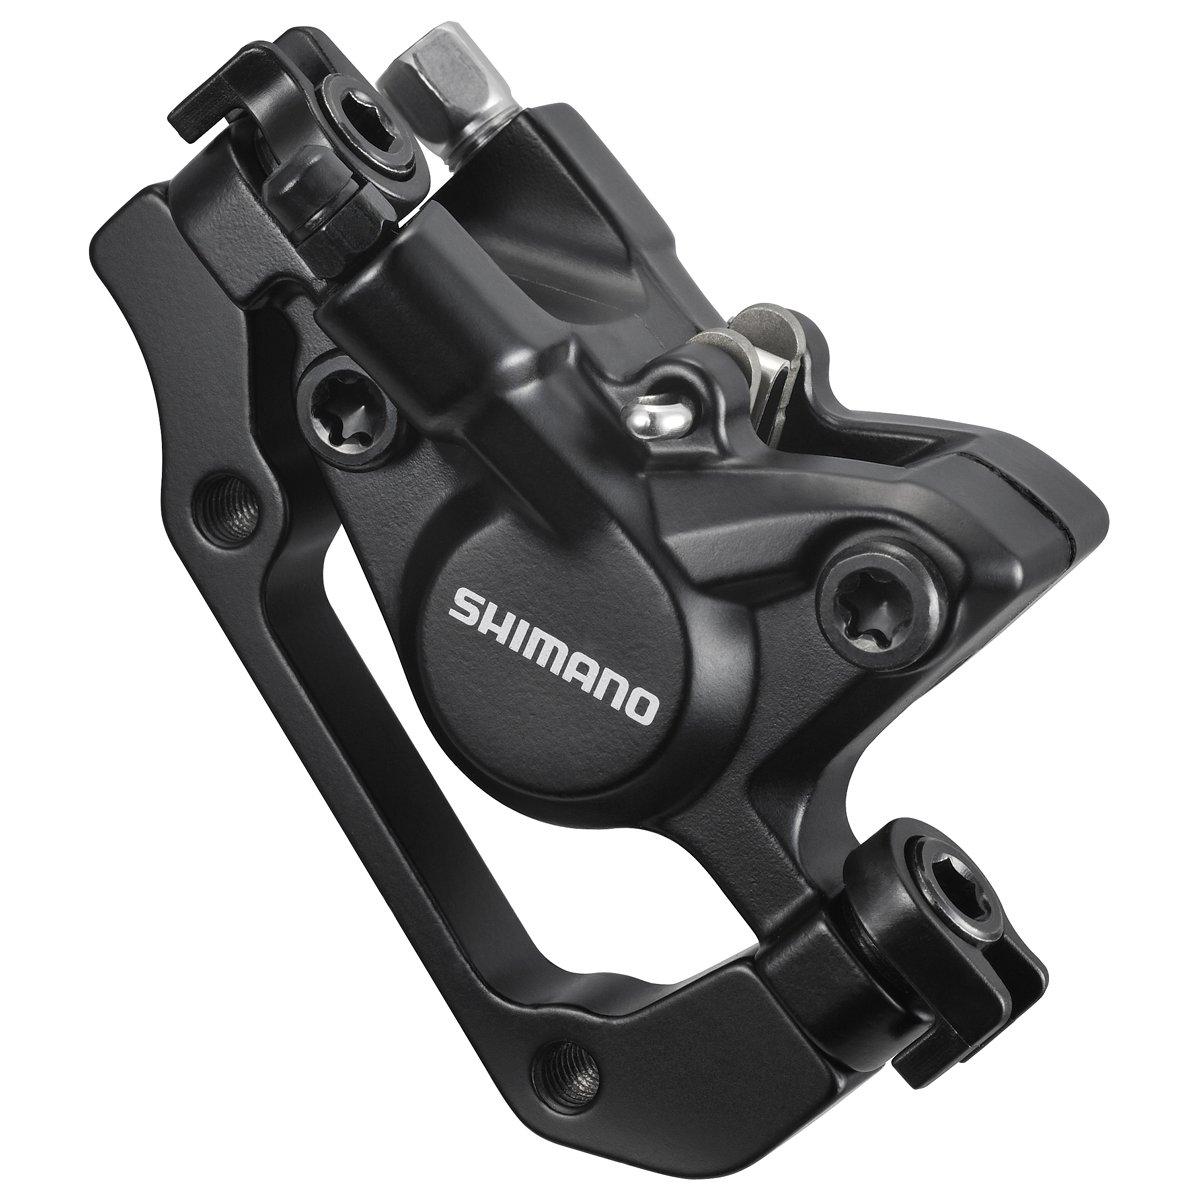 Shimano Deore M446 hydraulisk kaliber sort | Brake calipers